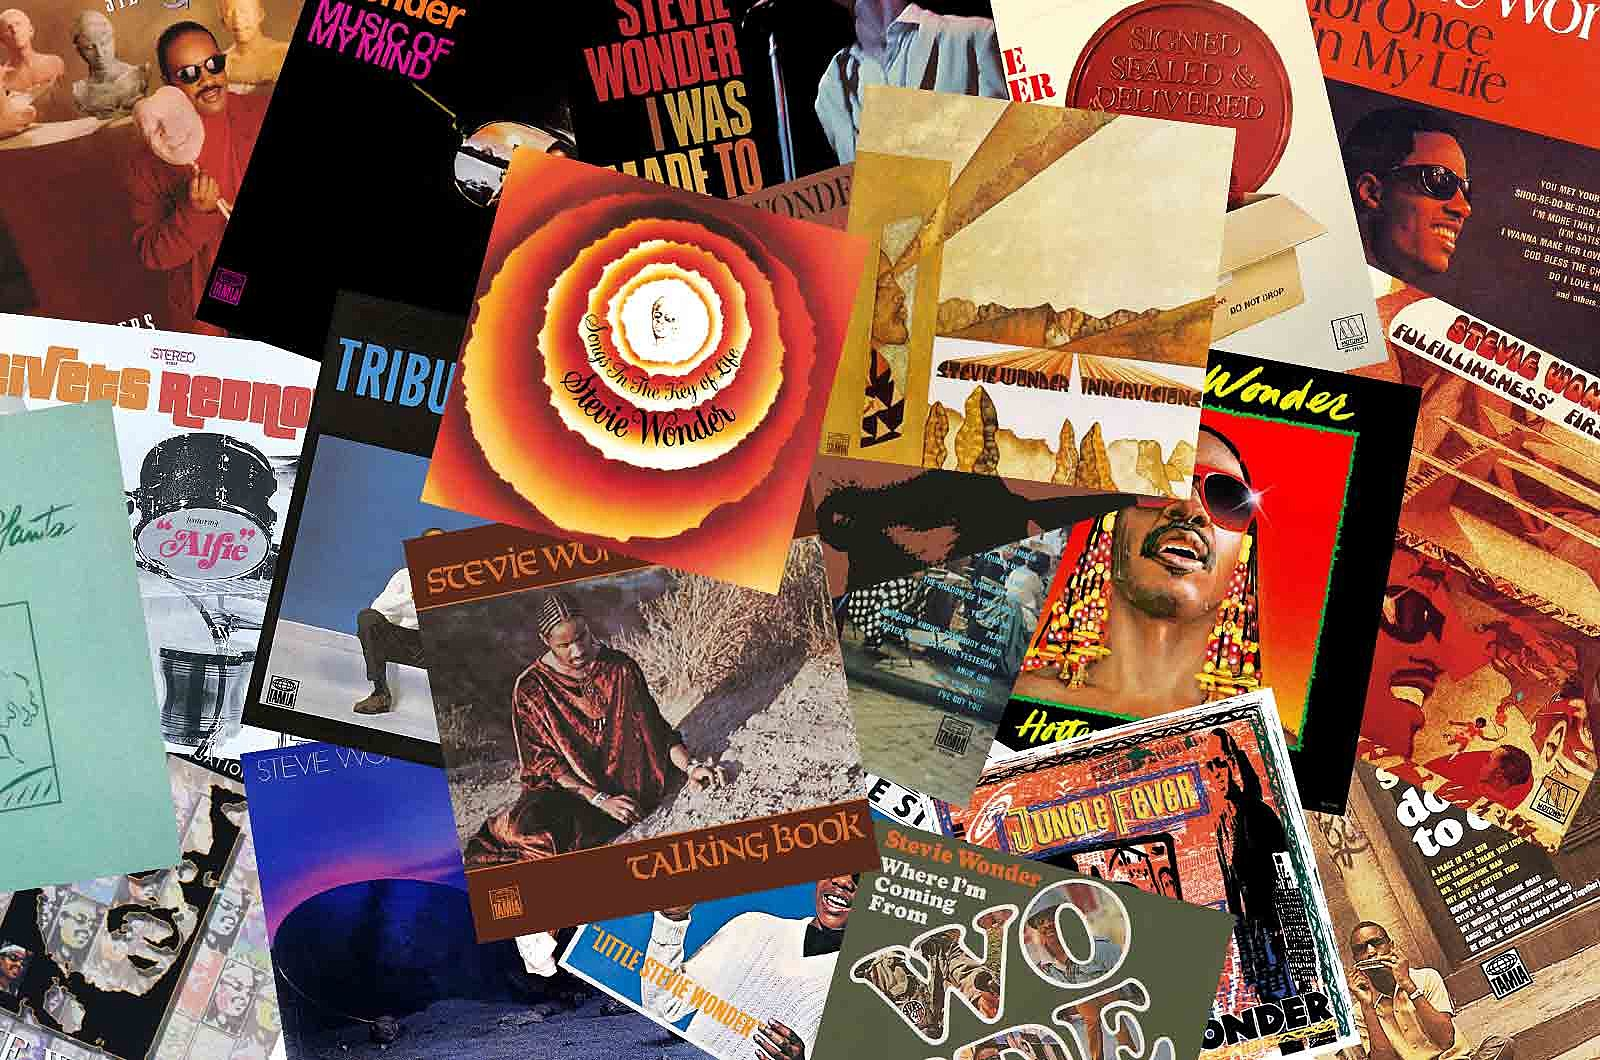 Stevie Wonder Albums Ranked Worst to Best